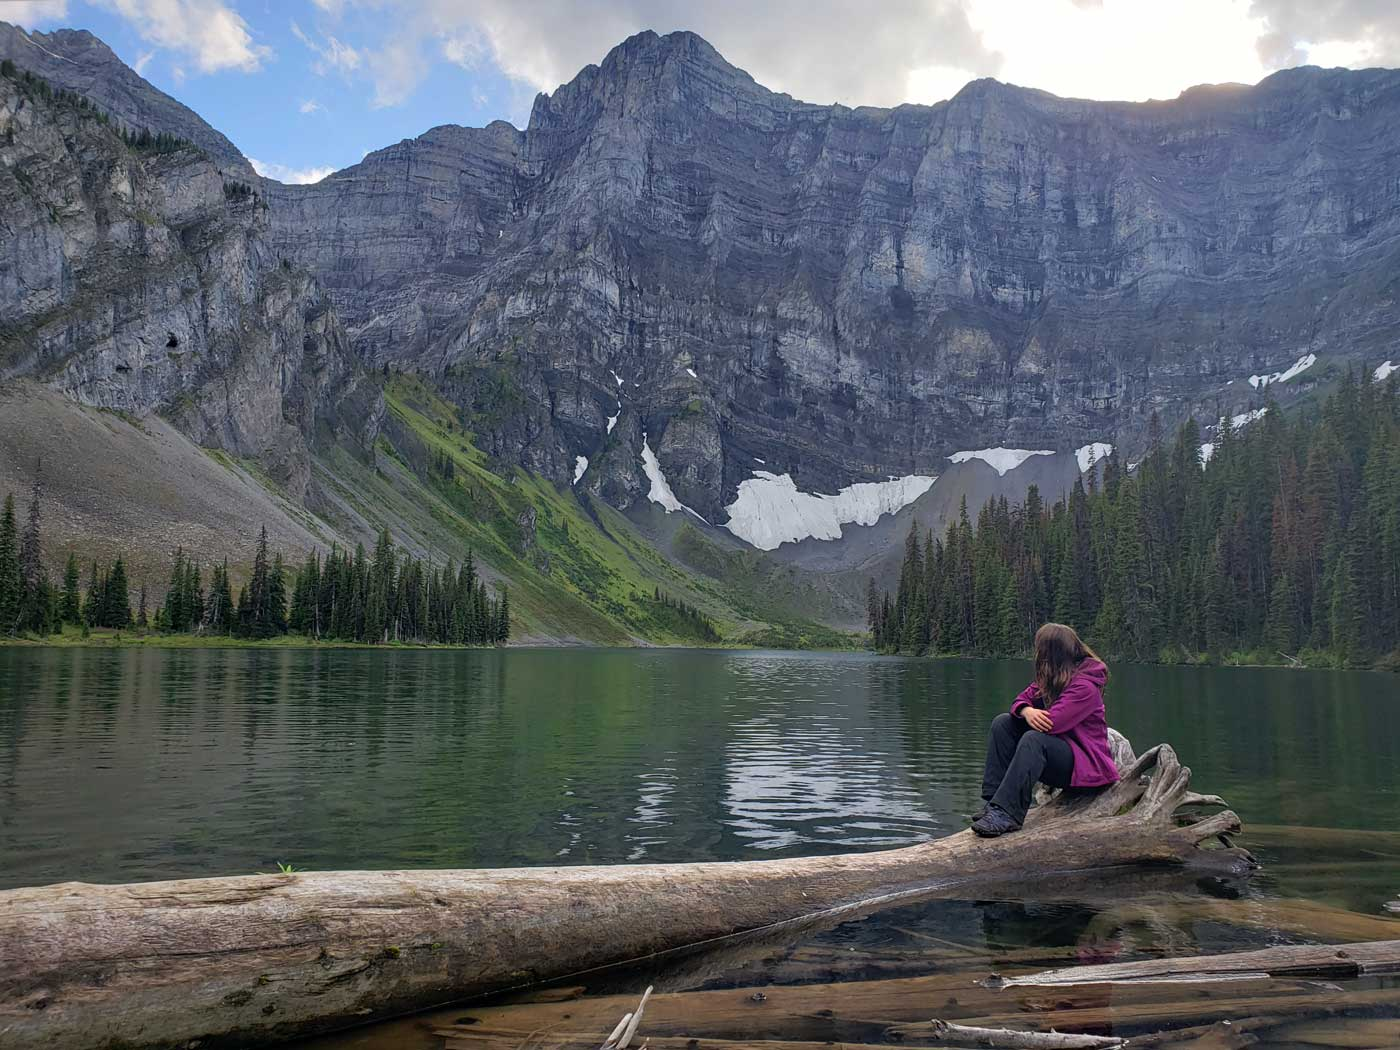 Jolene Rempel sitting on log in Rawson Lake in Kananaskis Country, Alberta, Canada.